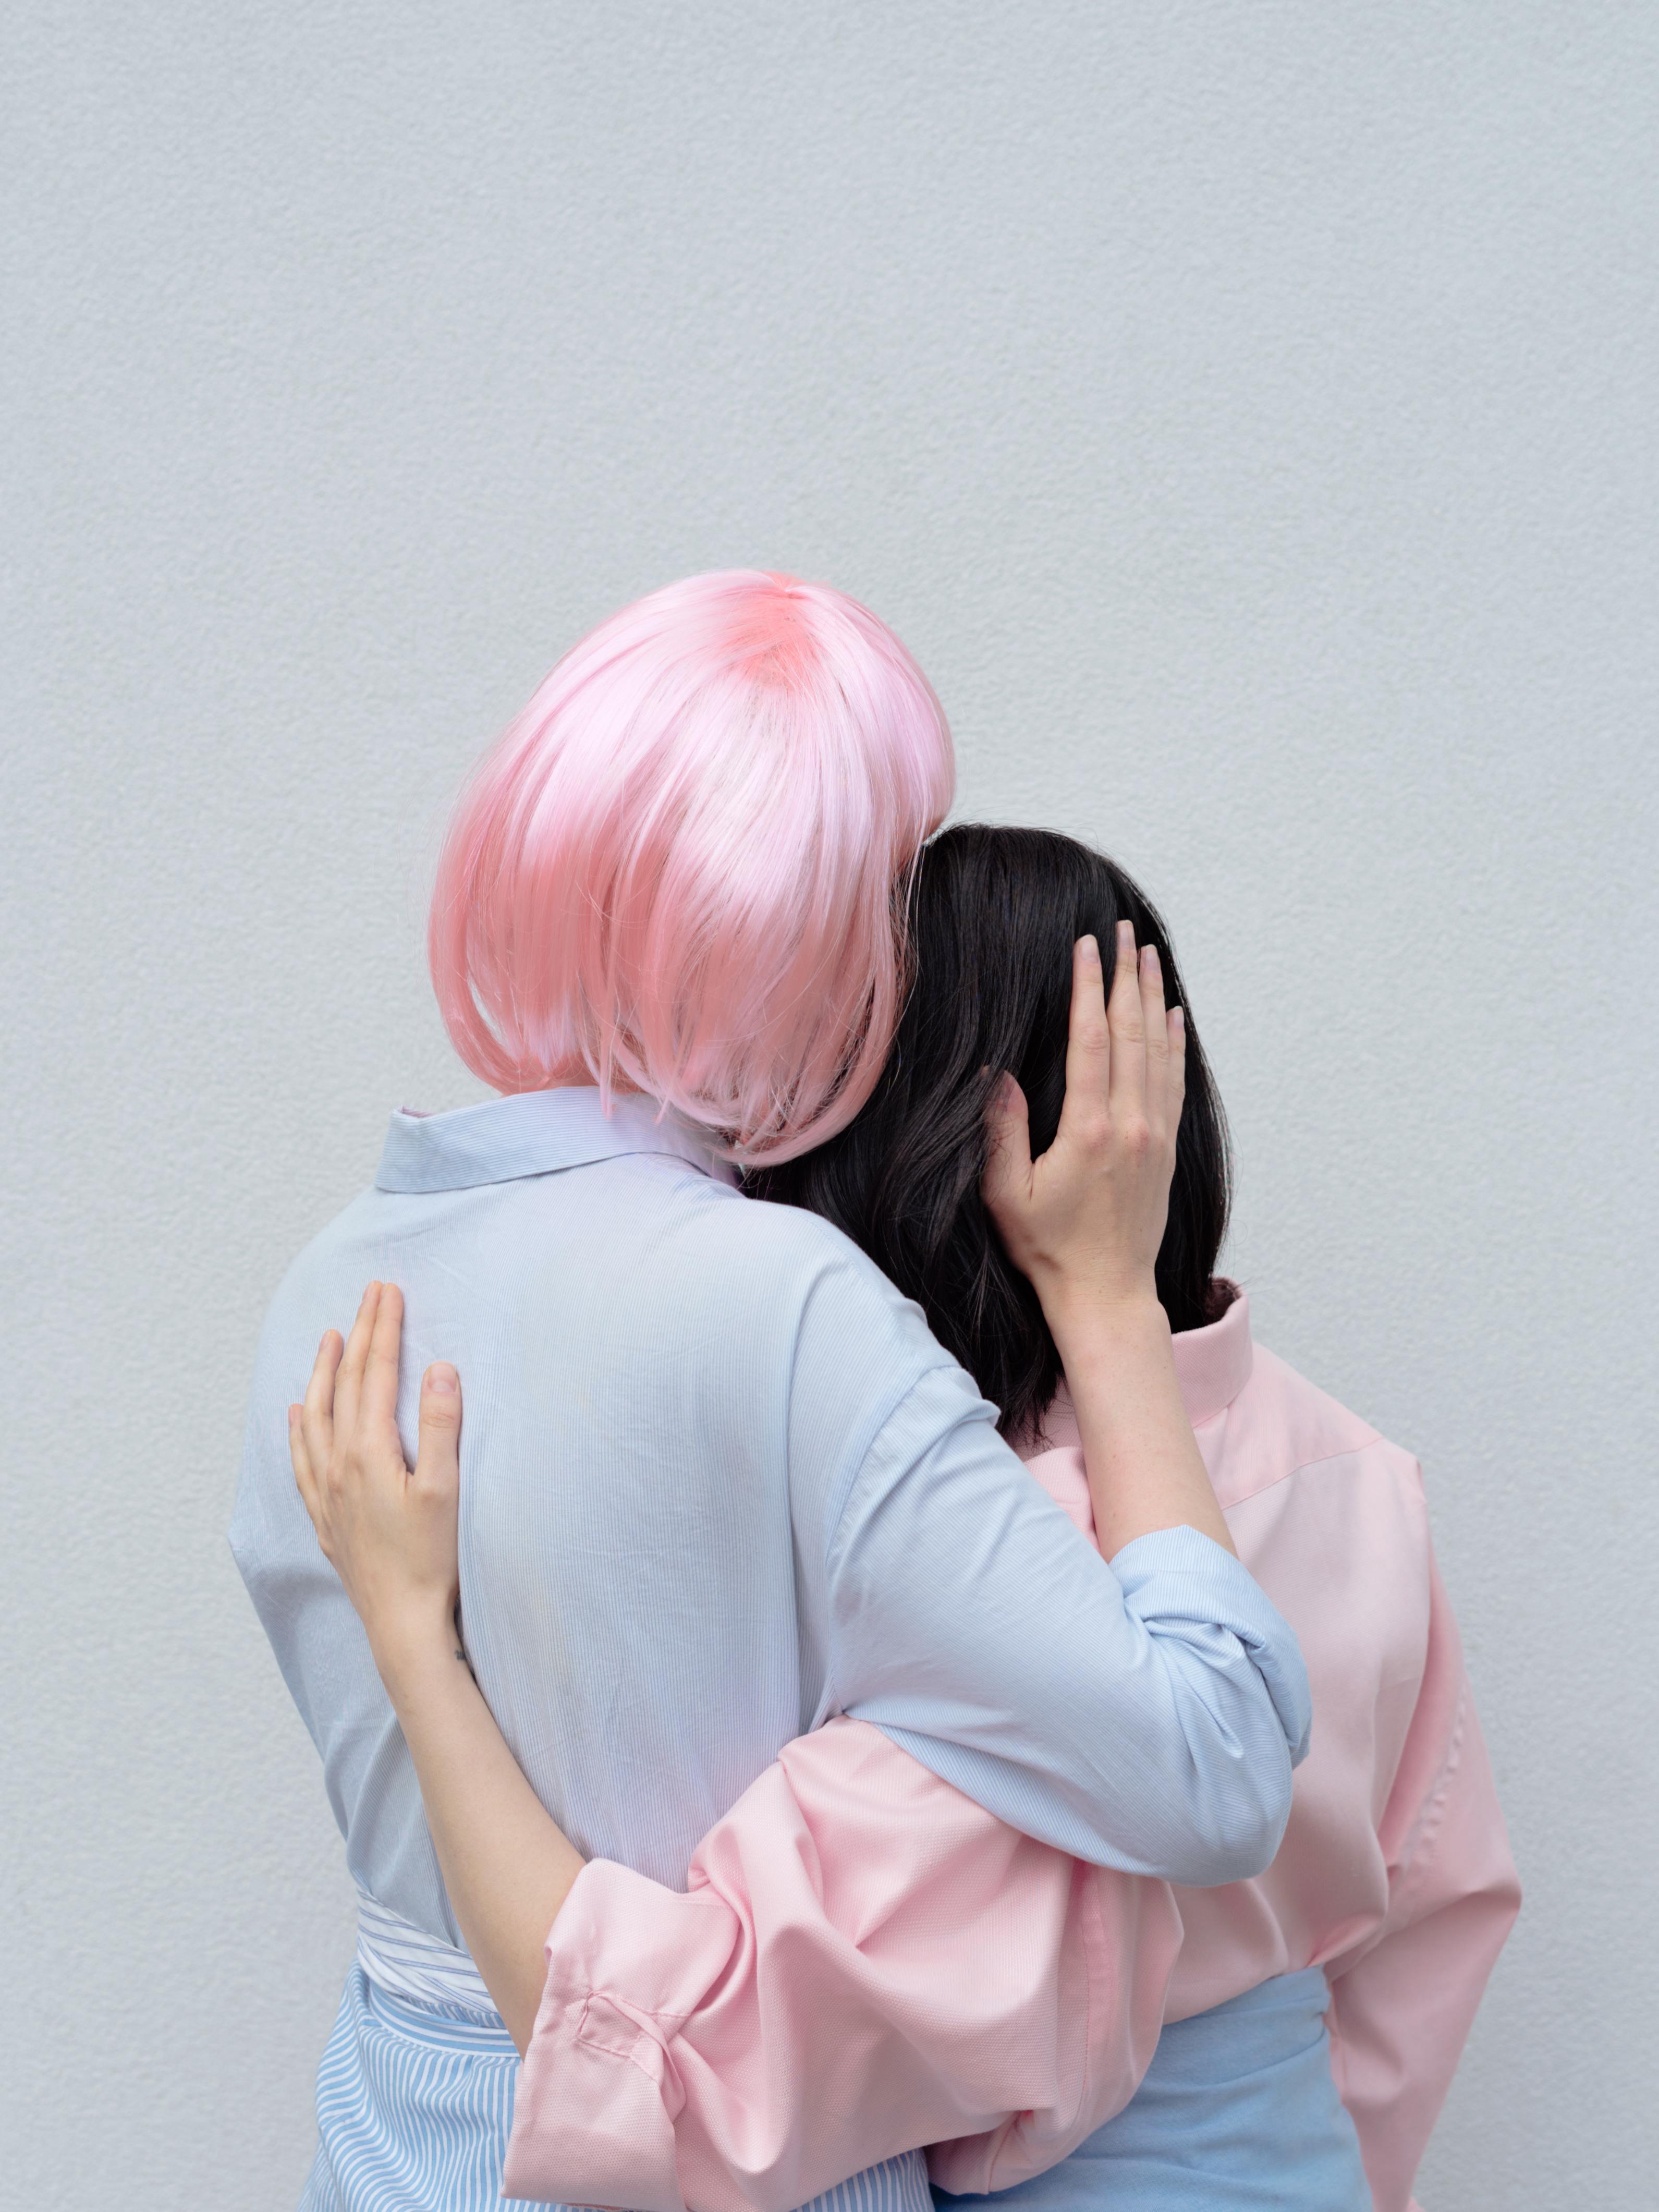 faceless women embracing gently in studio